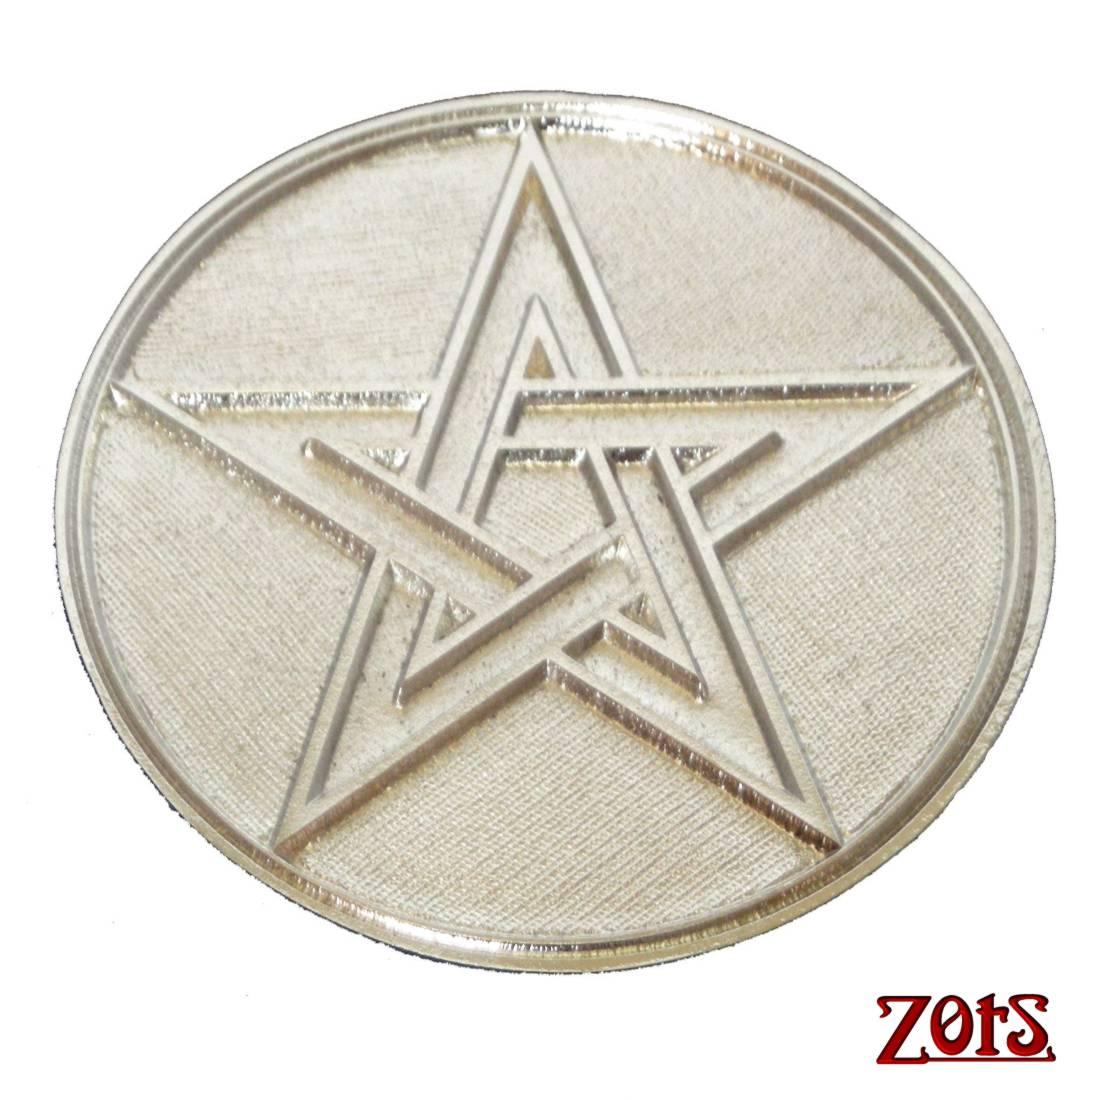 Altar Wicca - Instrumentos Mágicos  -  Zots